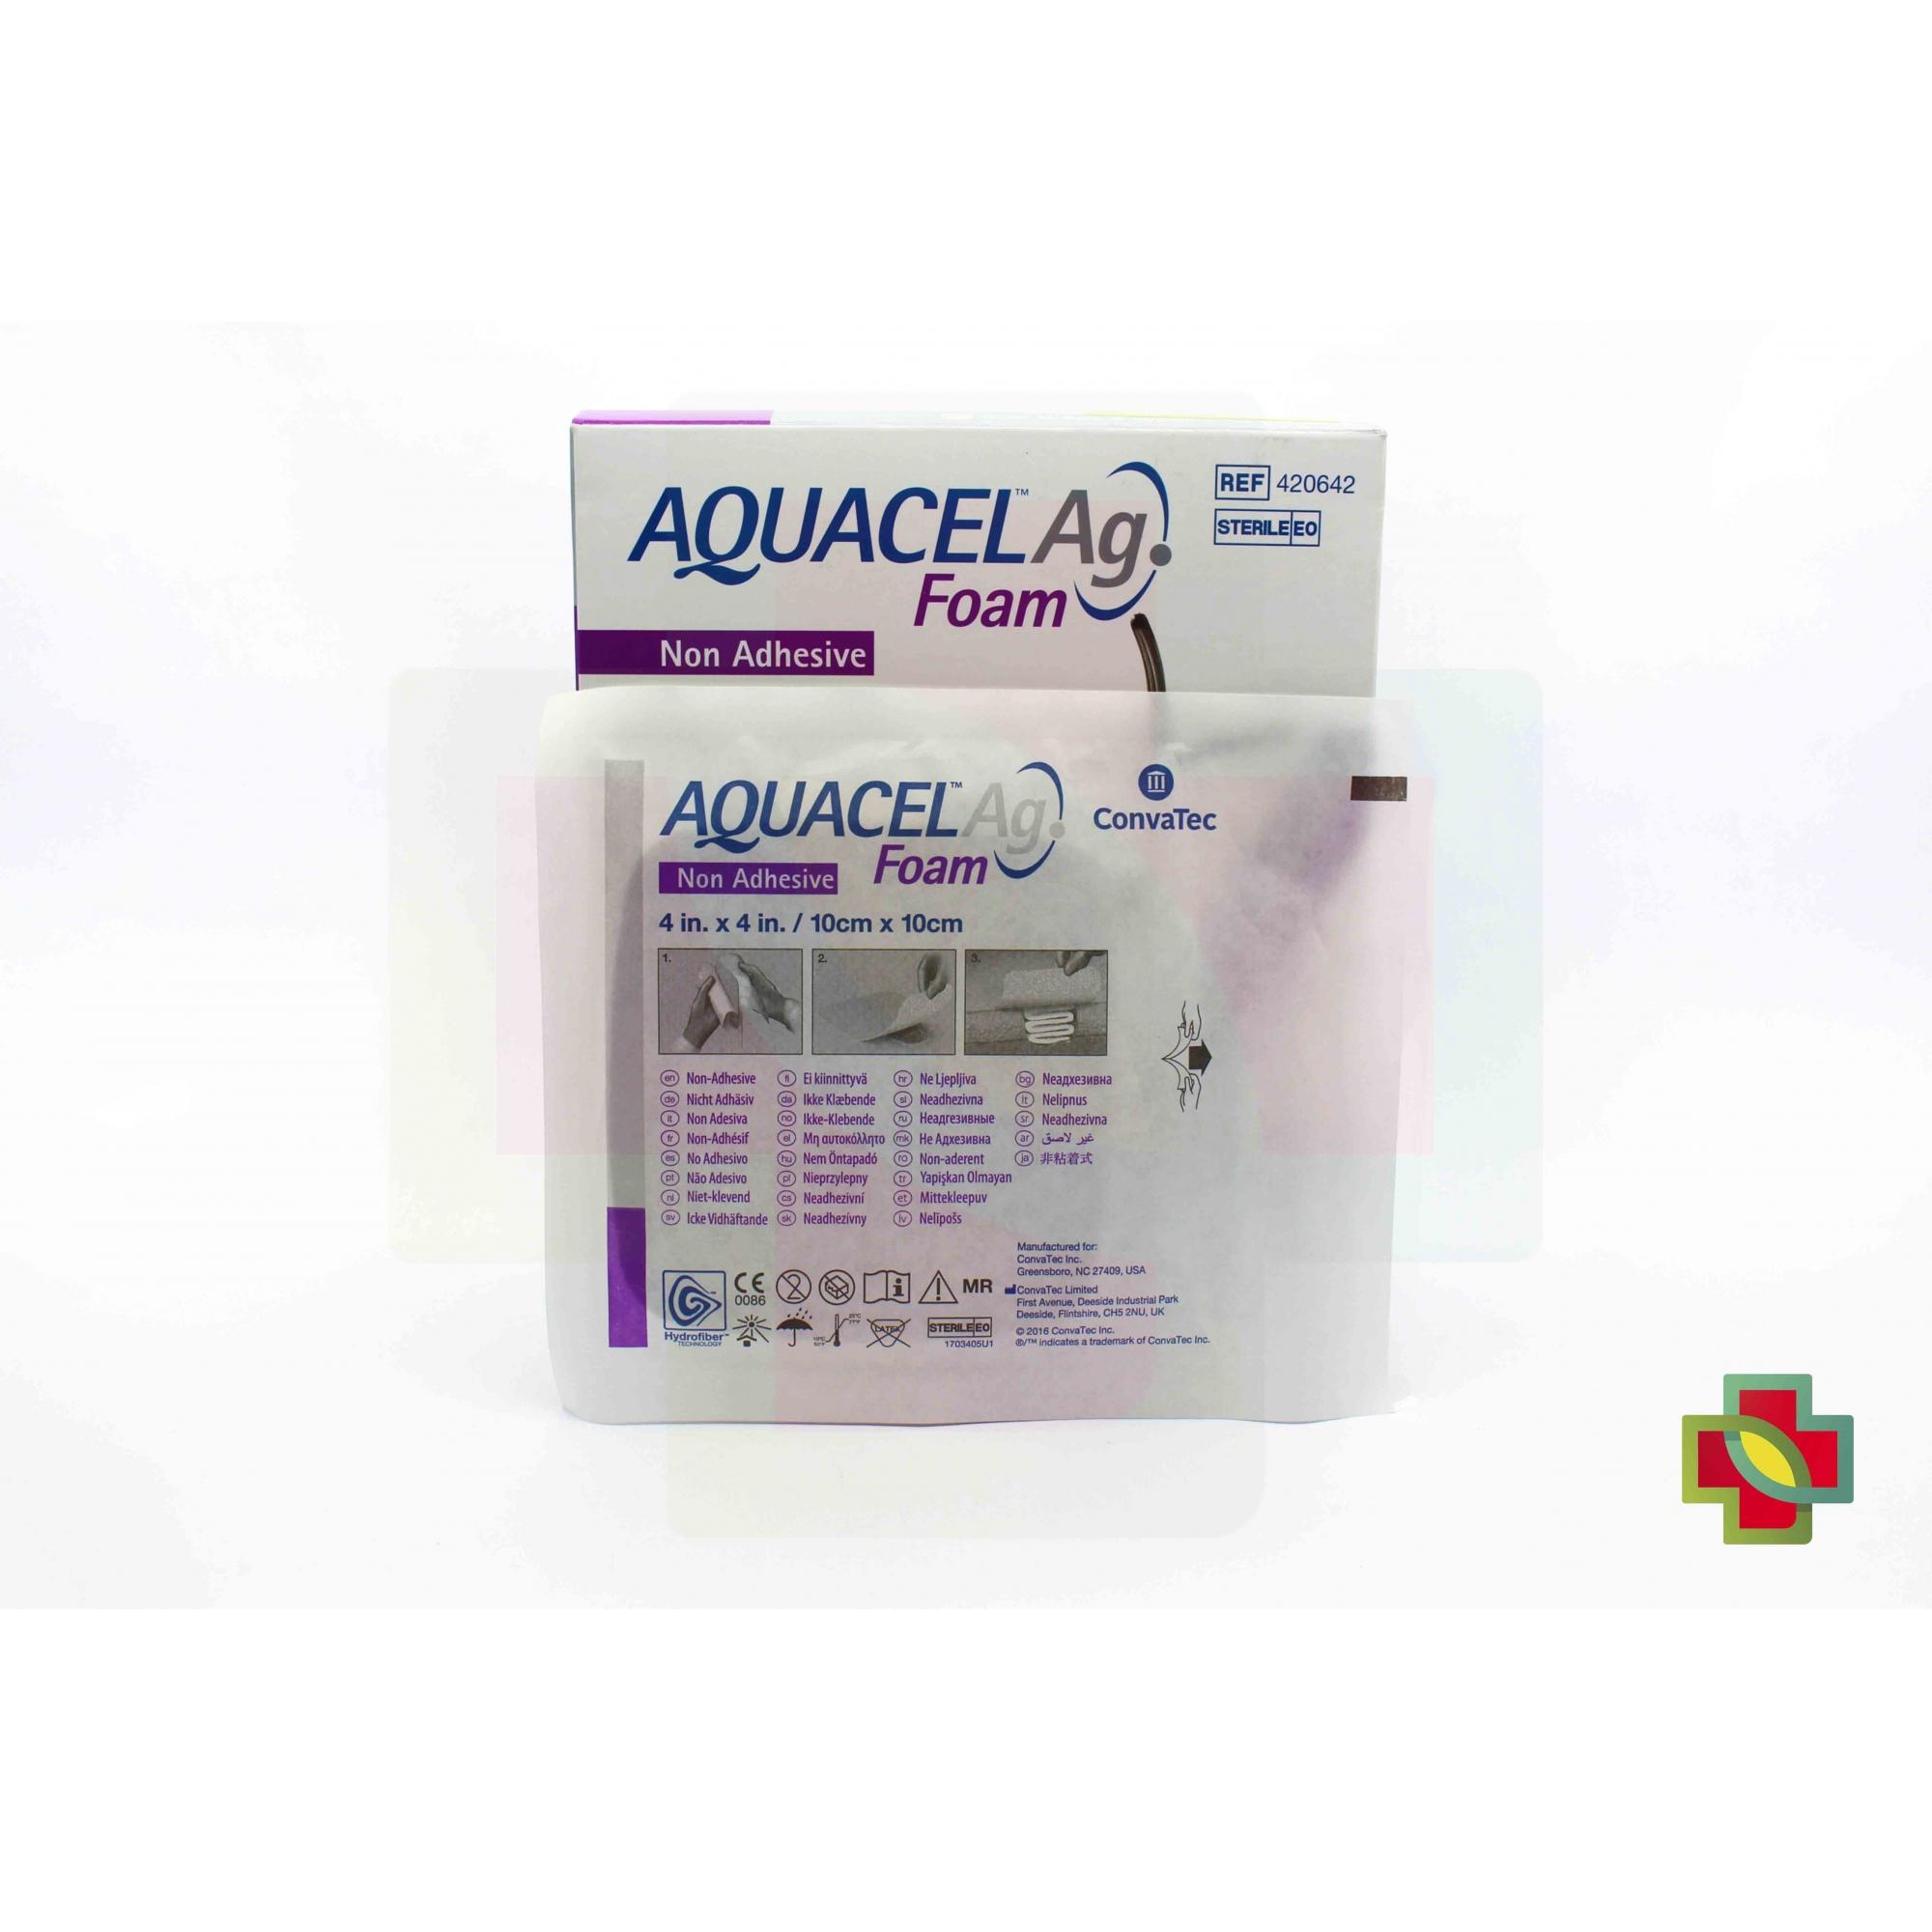 CURATIVO AQUACEL AG FOAM SEM ADESIVO 10 X 10 UND 420642 CONVATEC